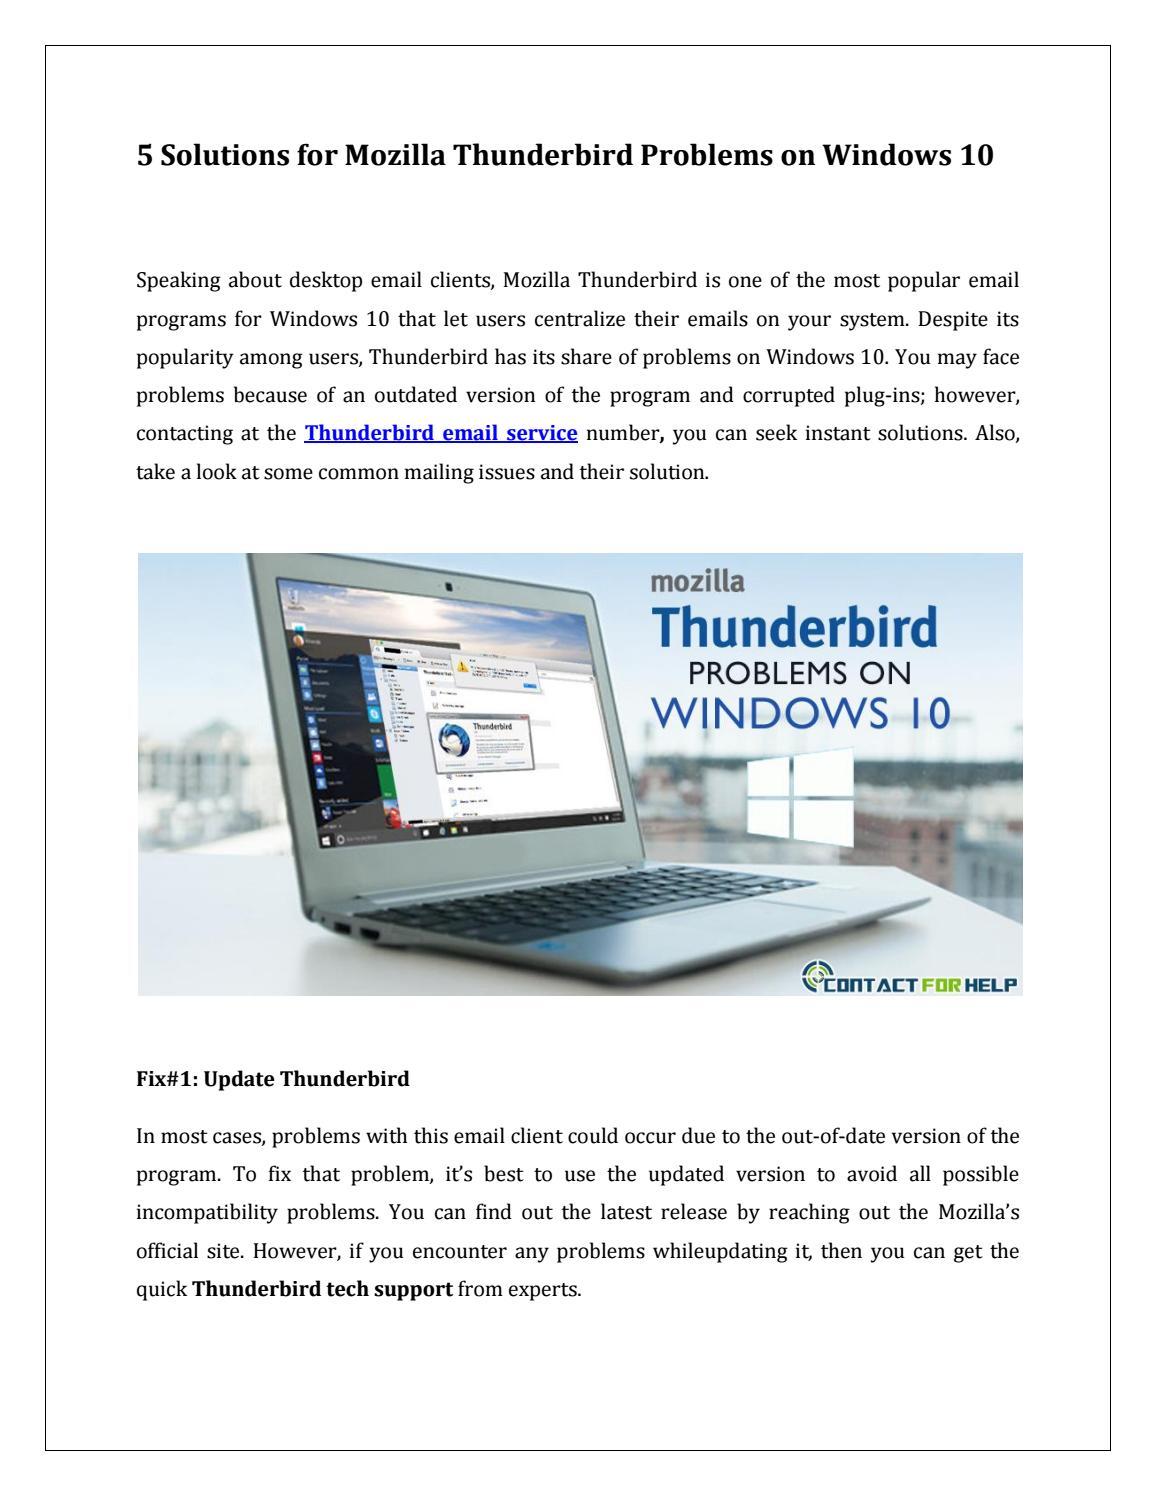 Mozilla Thunderbird problems on Windows 10 by Lisa Heydon - issuu